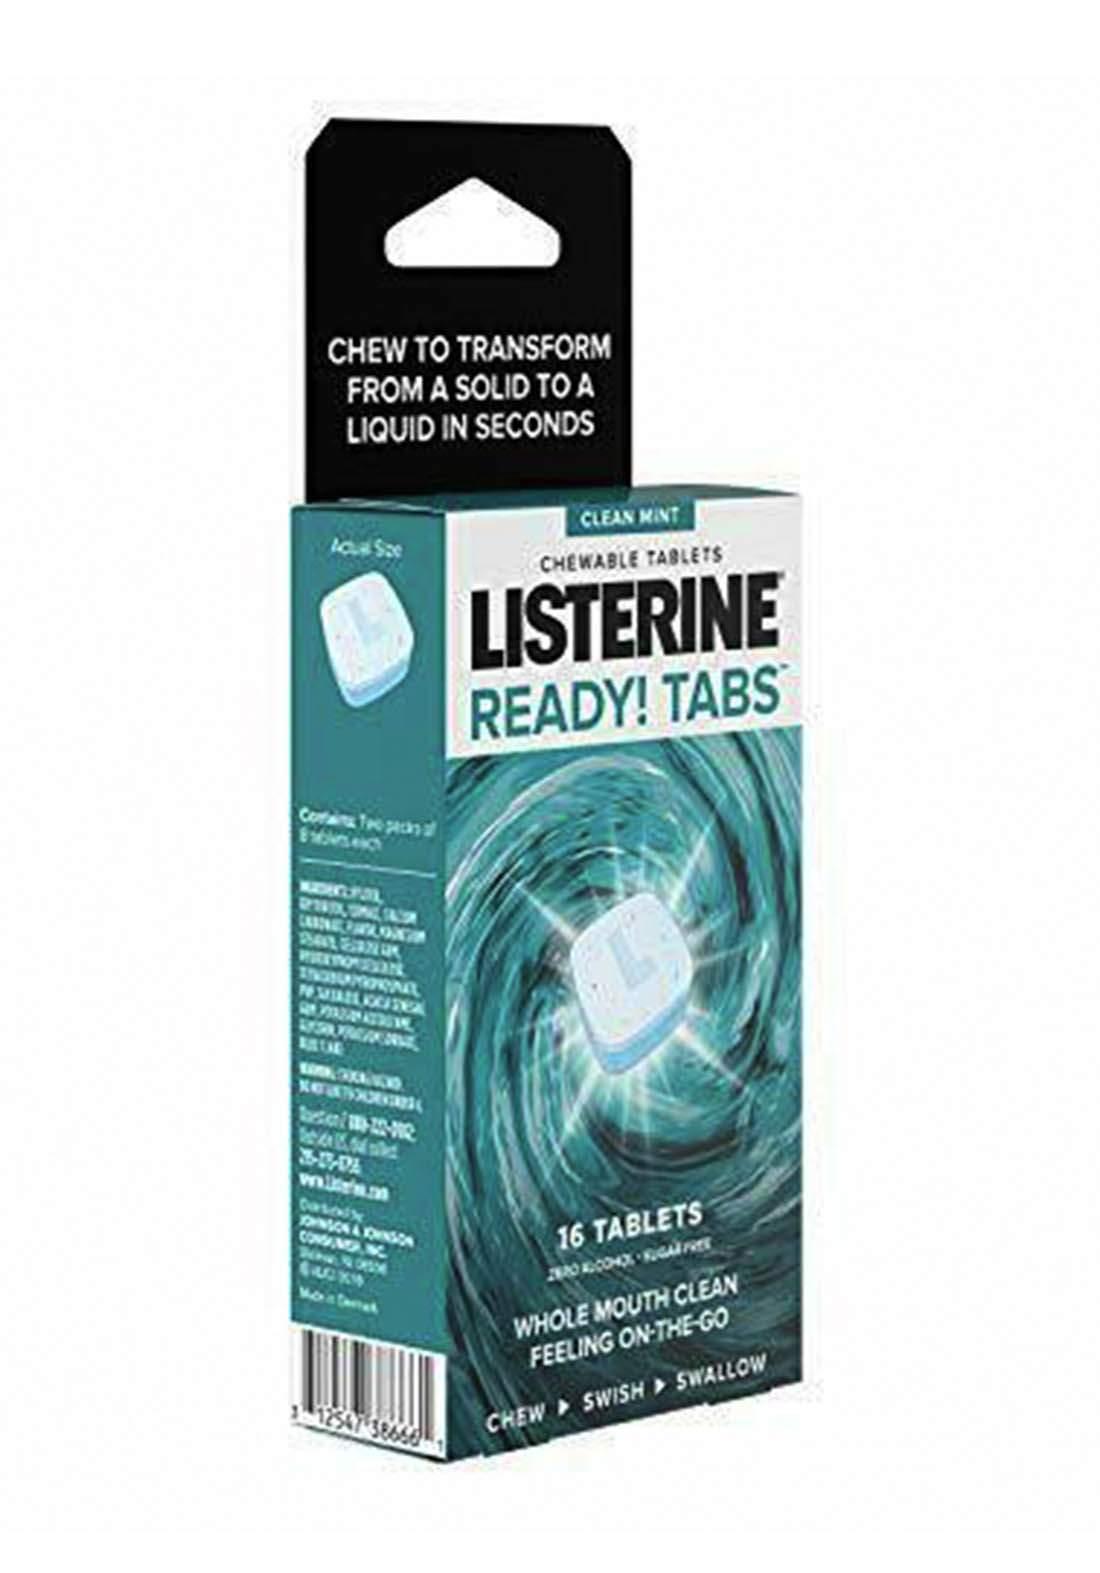 Listerine Ready! Tabs 16 Tablets  أقراص  النعناع